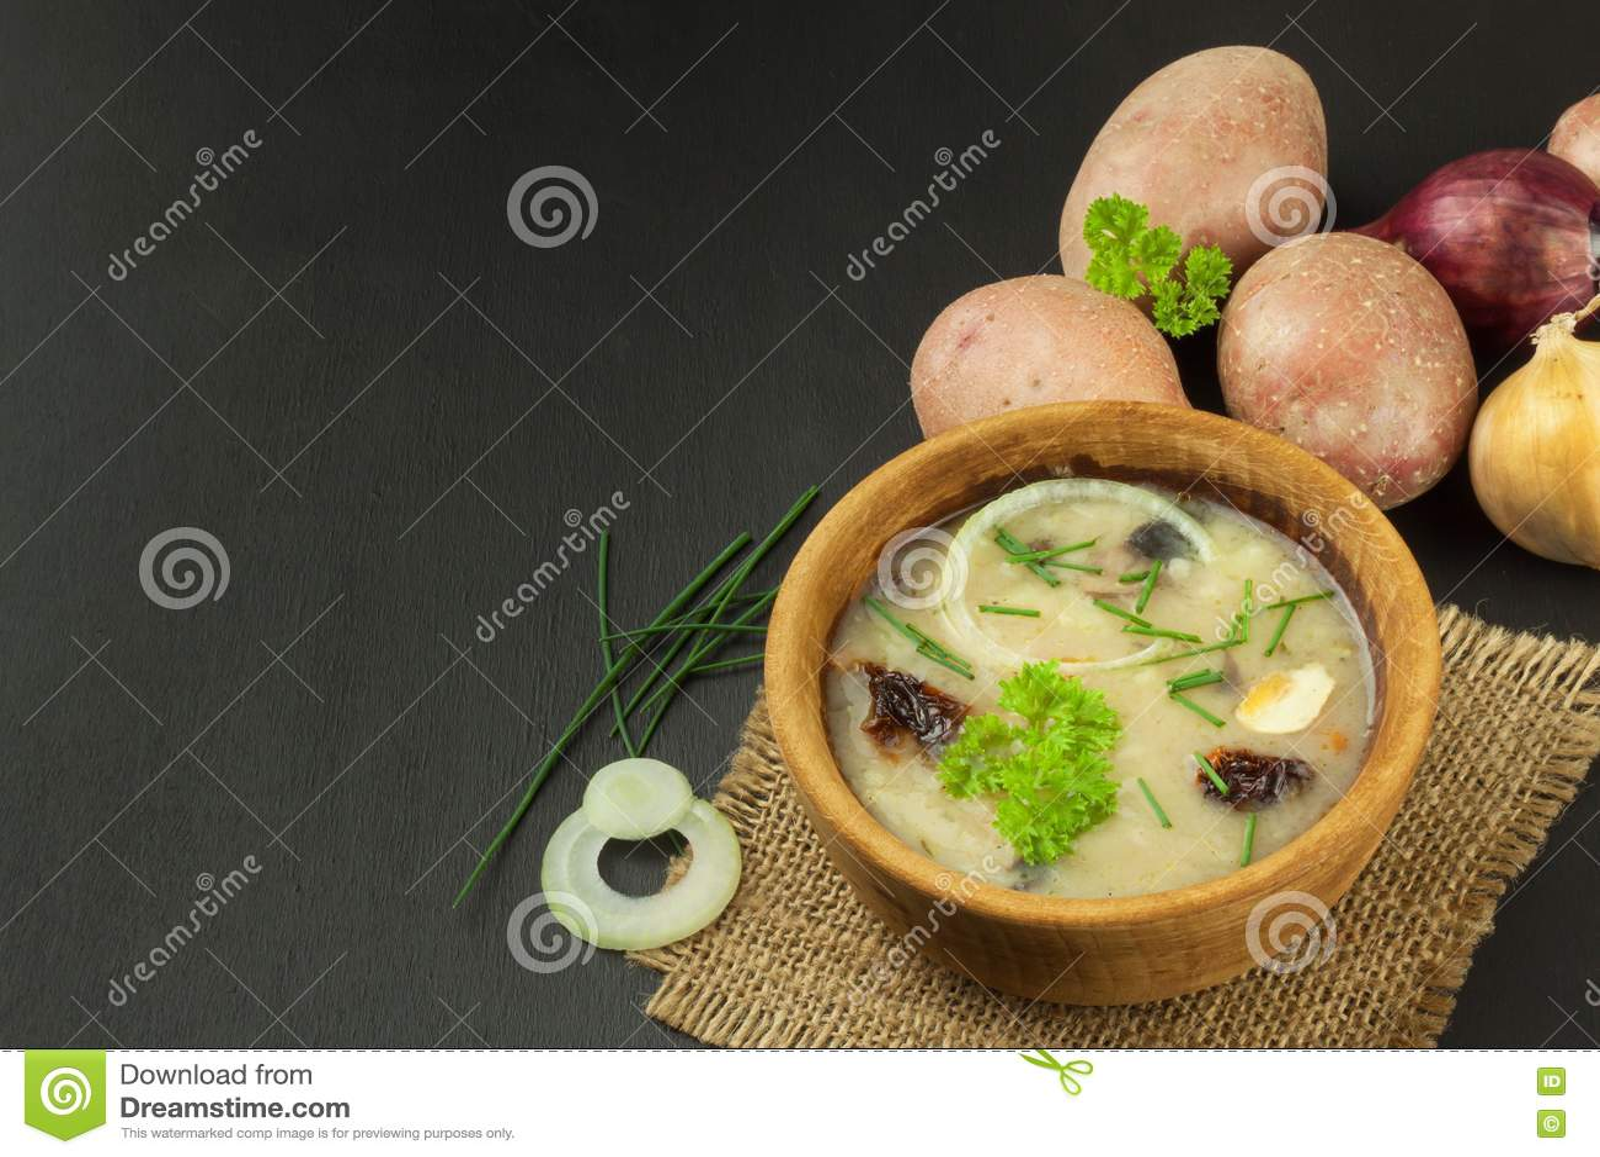 kitchen prep table design for small space 自创土豆汤用蘑菇碗用在木桌上的土豆汤食物例证厨房准备向量妇女库存图片 自创土豆汤用蘑菇碗用在木桌上的土豆汤食物